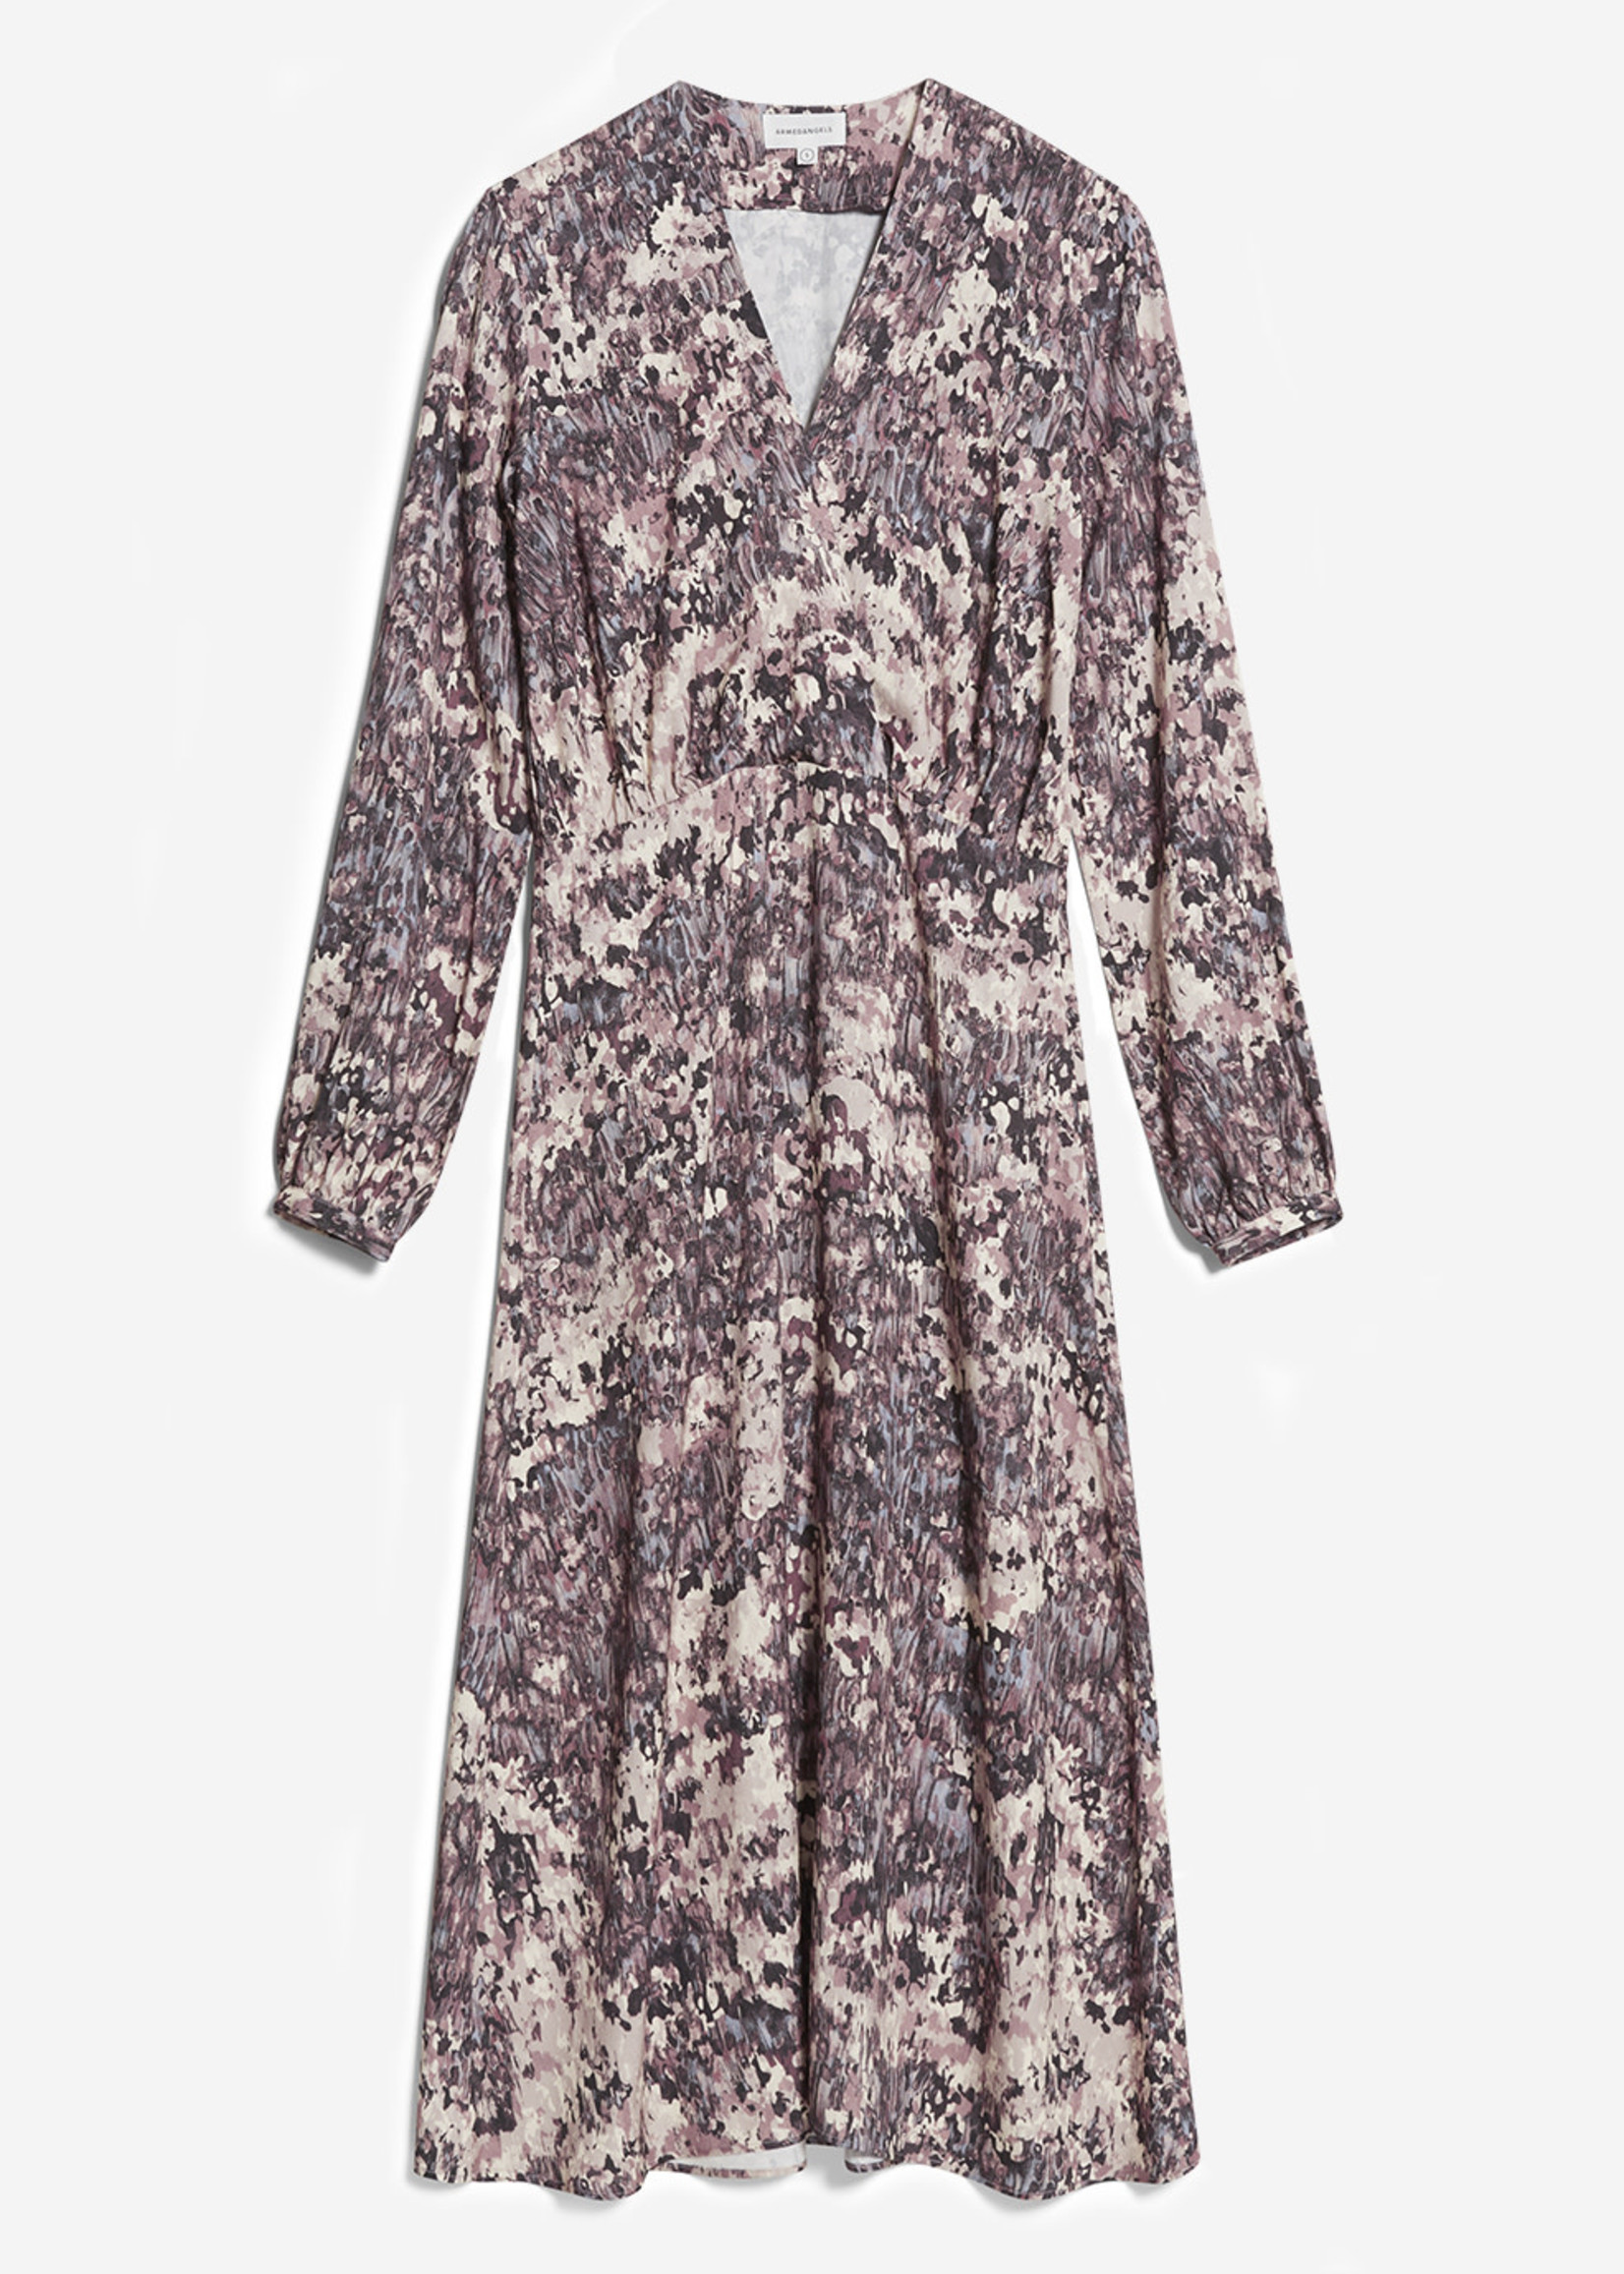 Armedangels Aleixaa Early Birch Dress